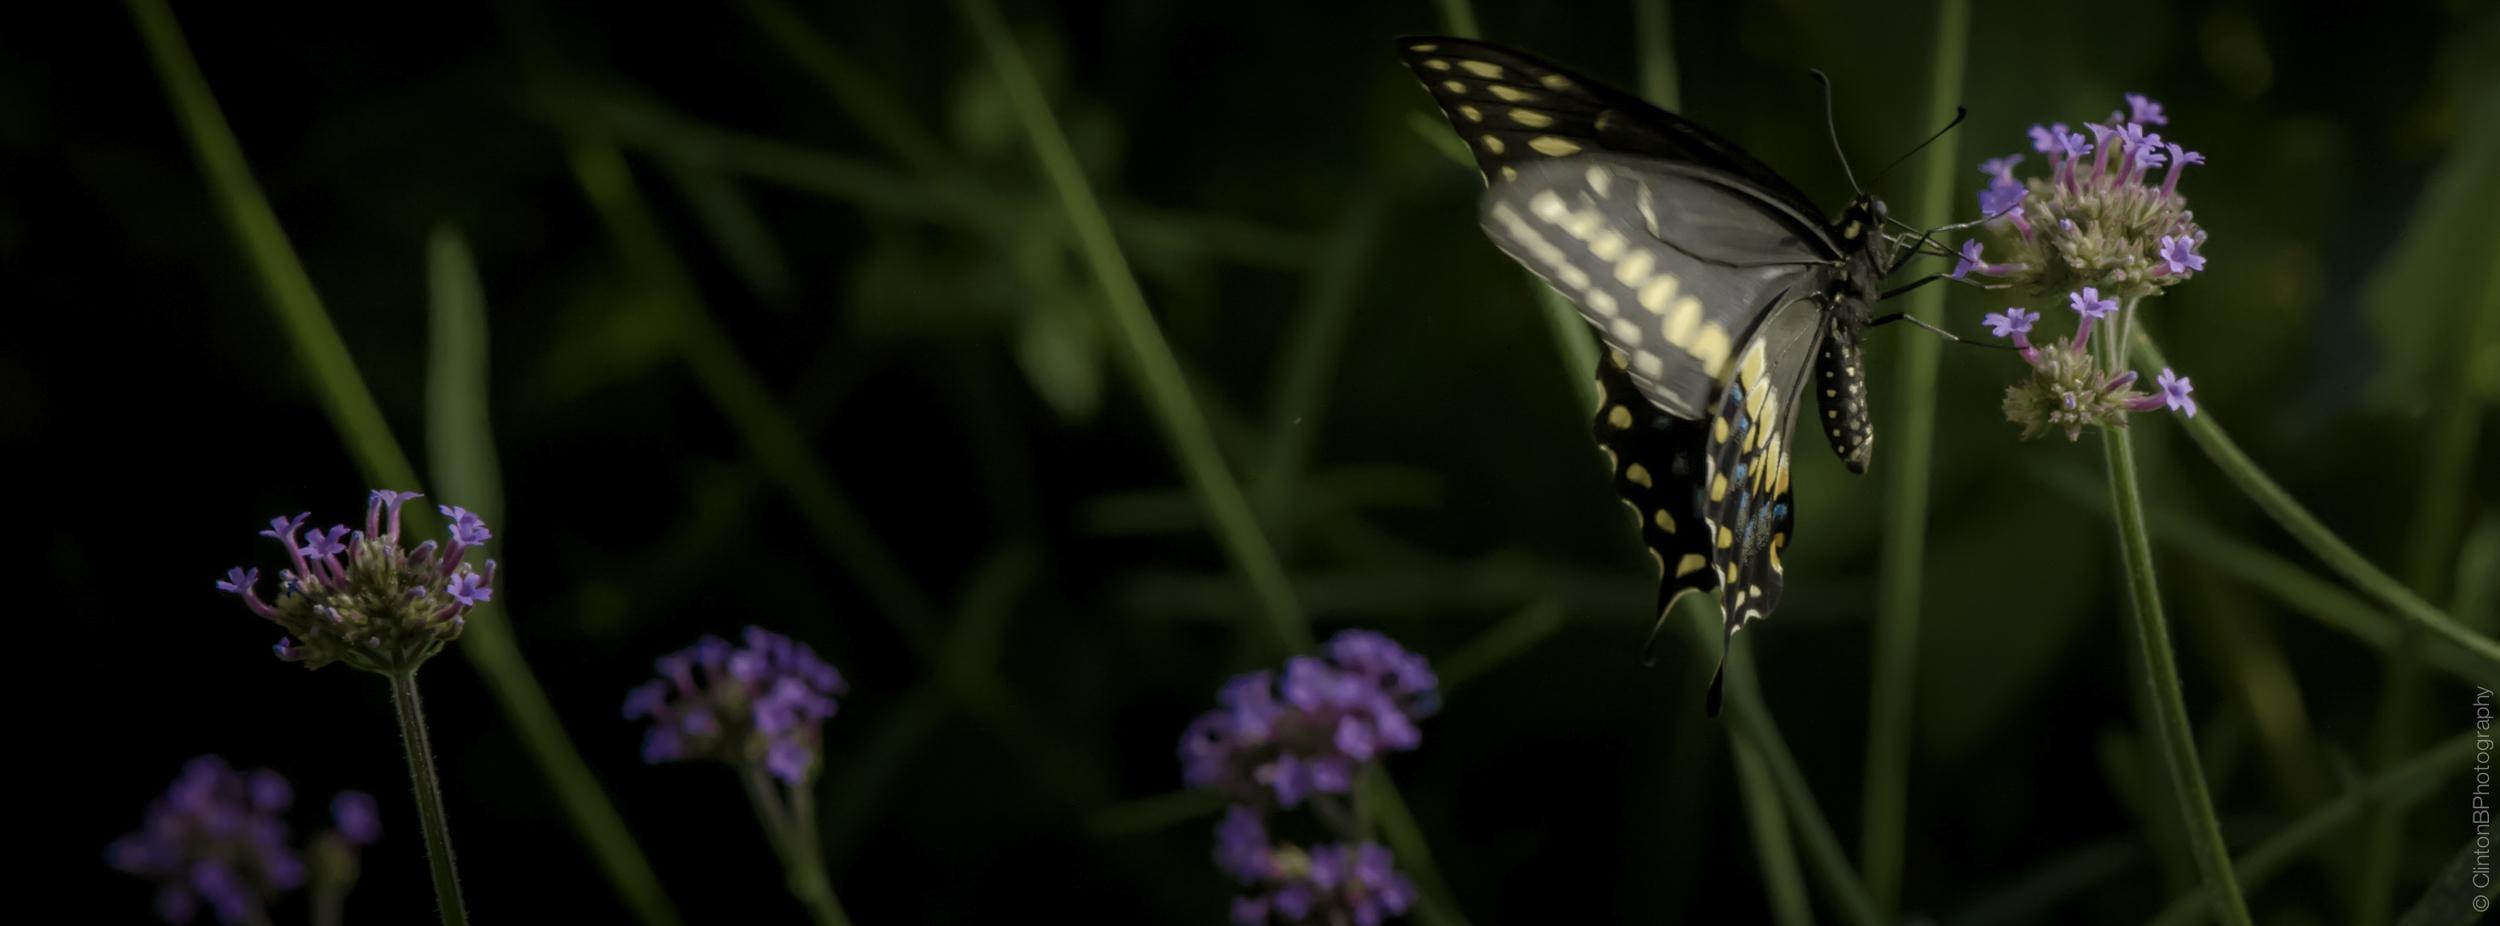 BrooklynButterfly